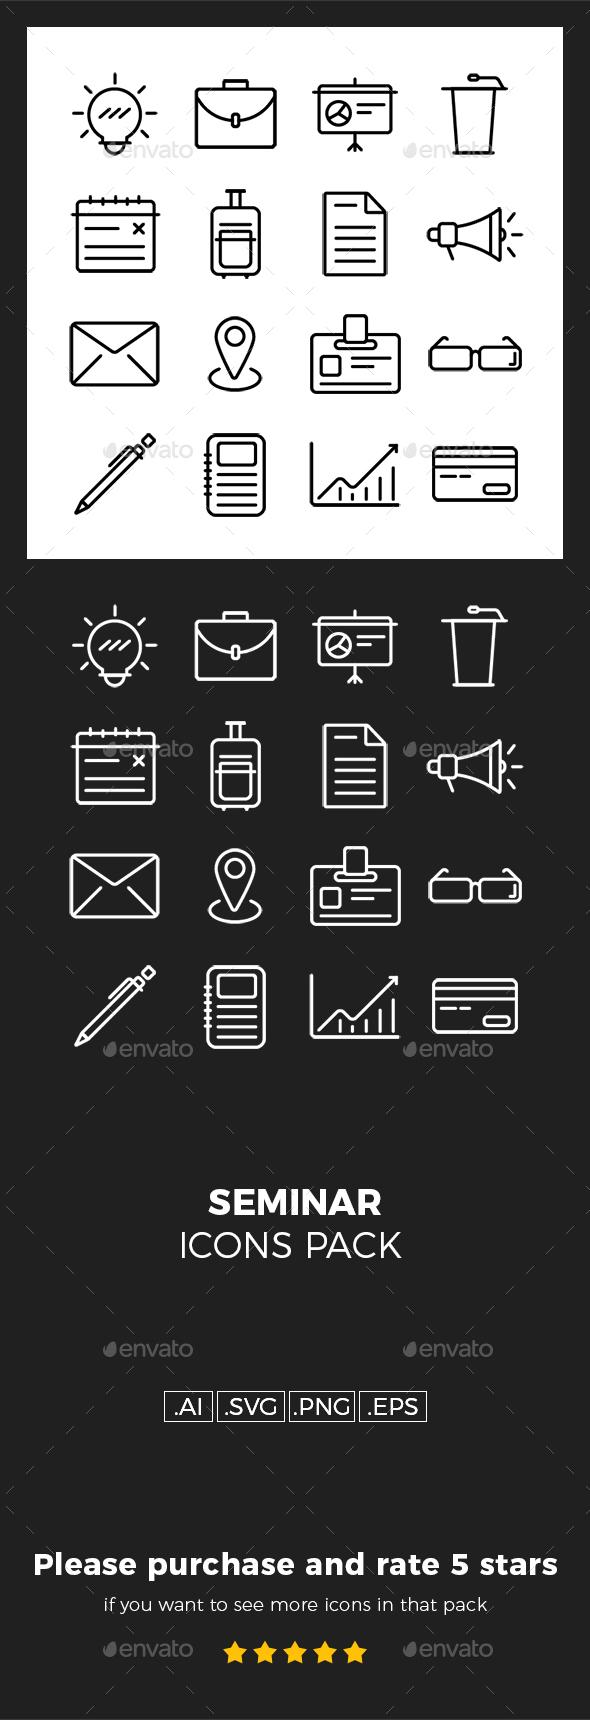 Seminar Icons Pack - Icons